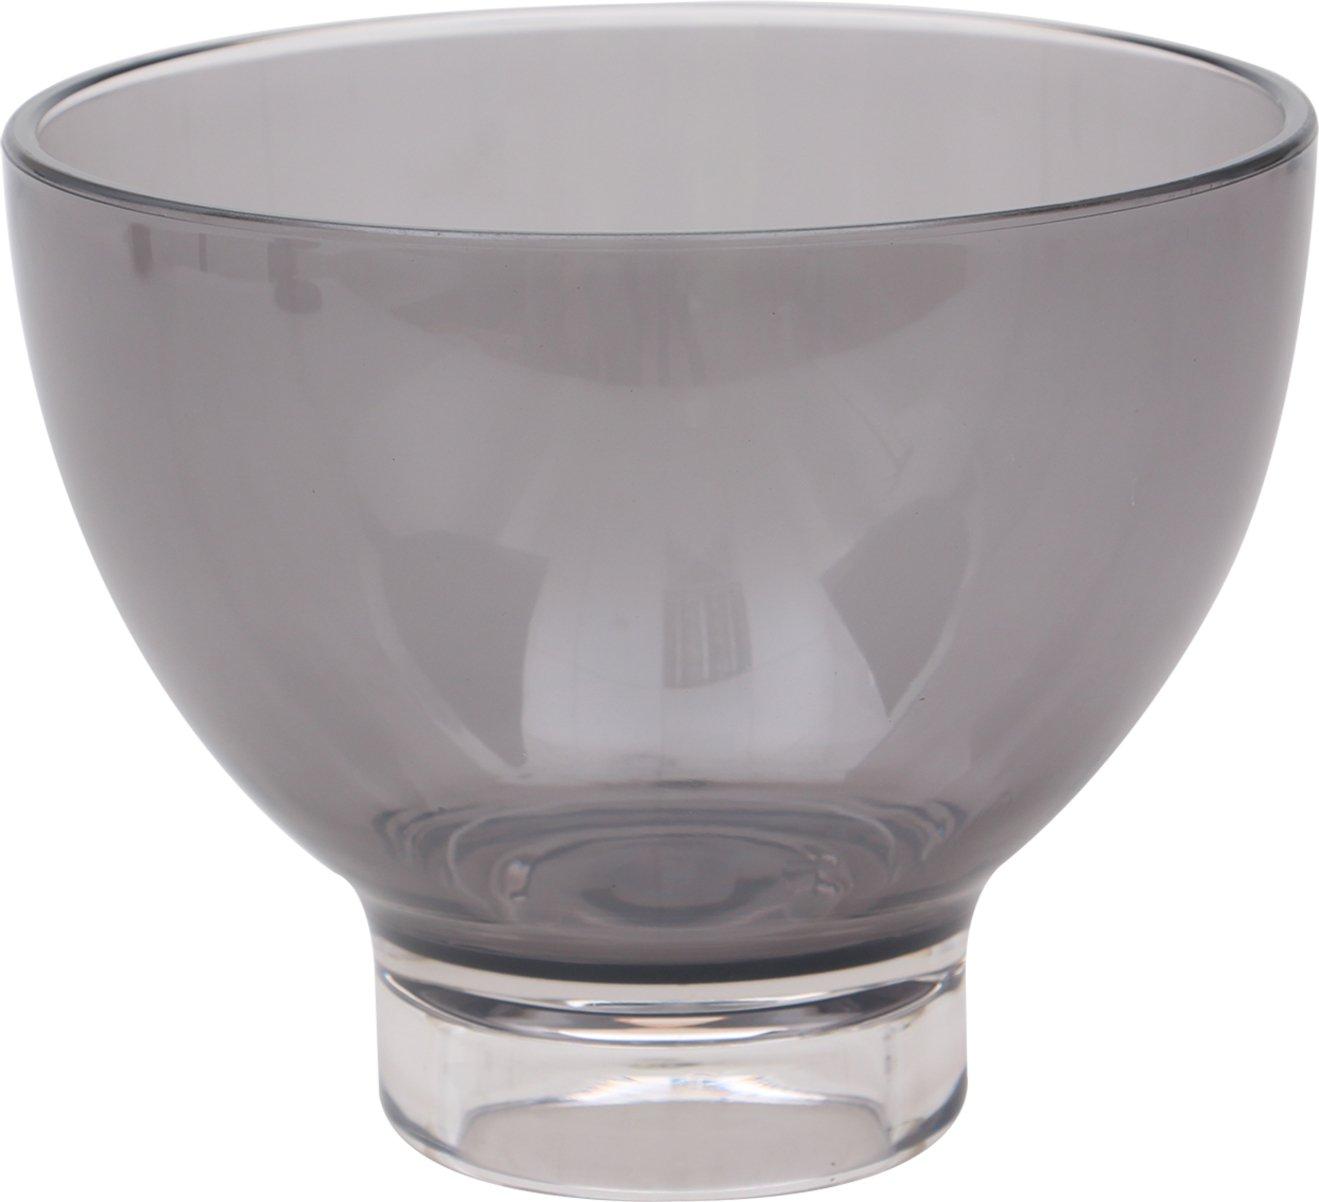 Epicure Footed Serving Bowl, 26 oz, Tritan, Smoke by Carlisle (Image #6)